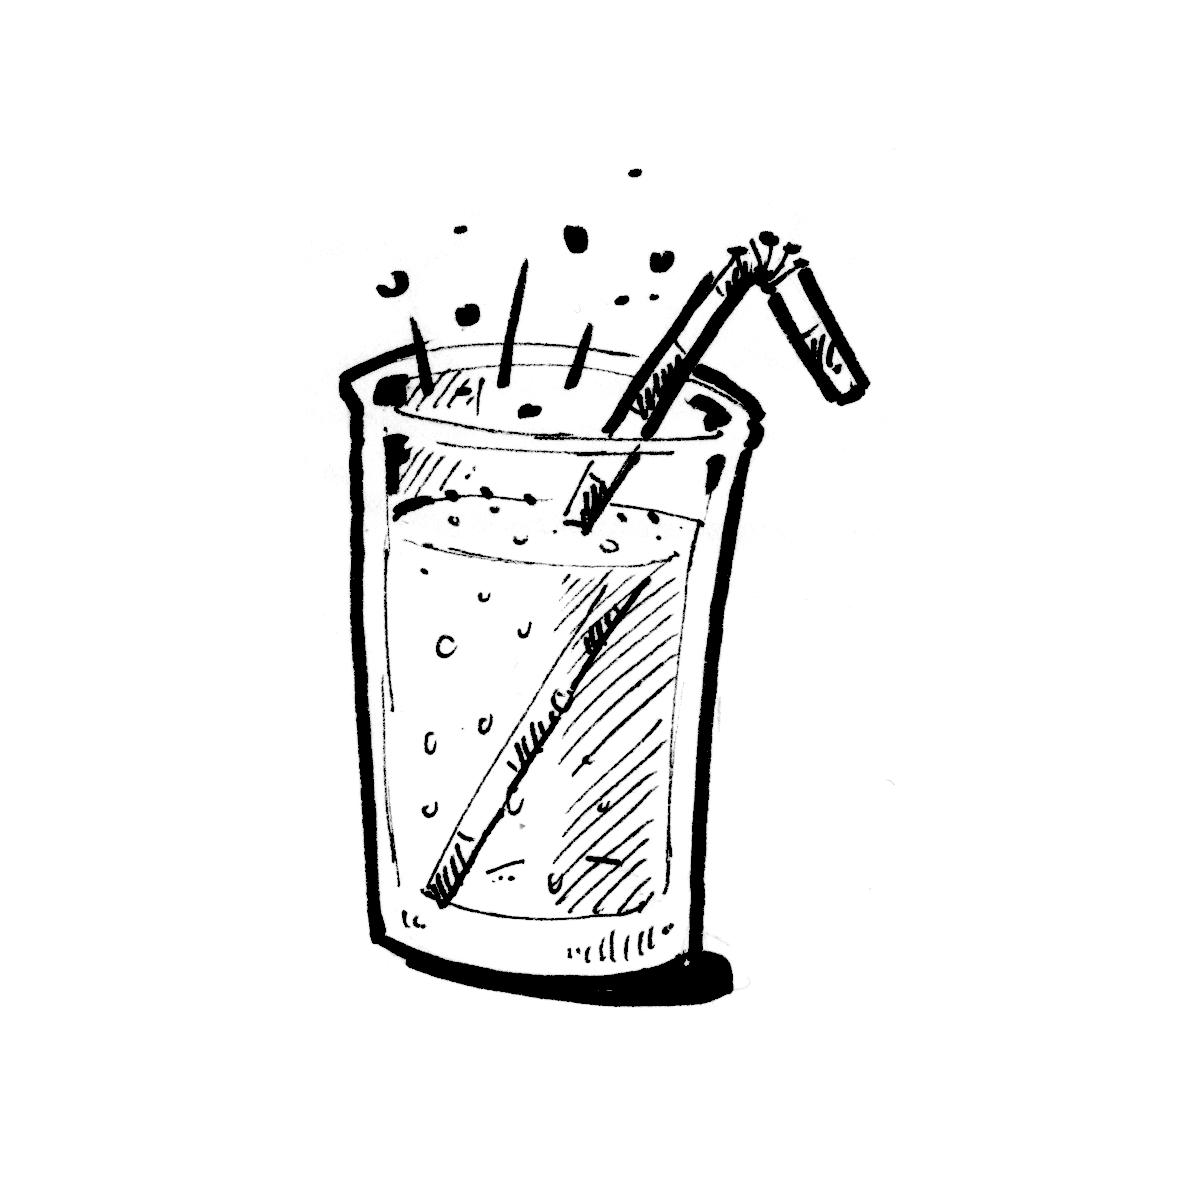 16-vignette-food-menu-hardcore-lemonade.jpg